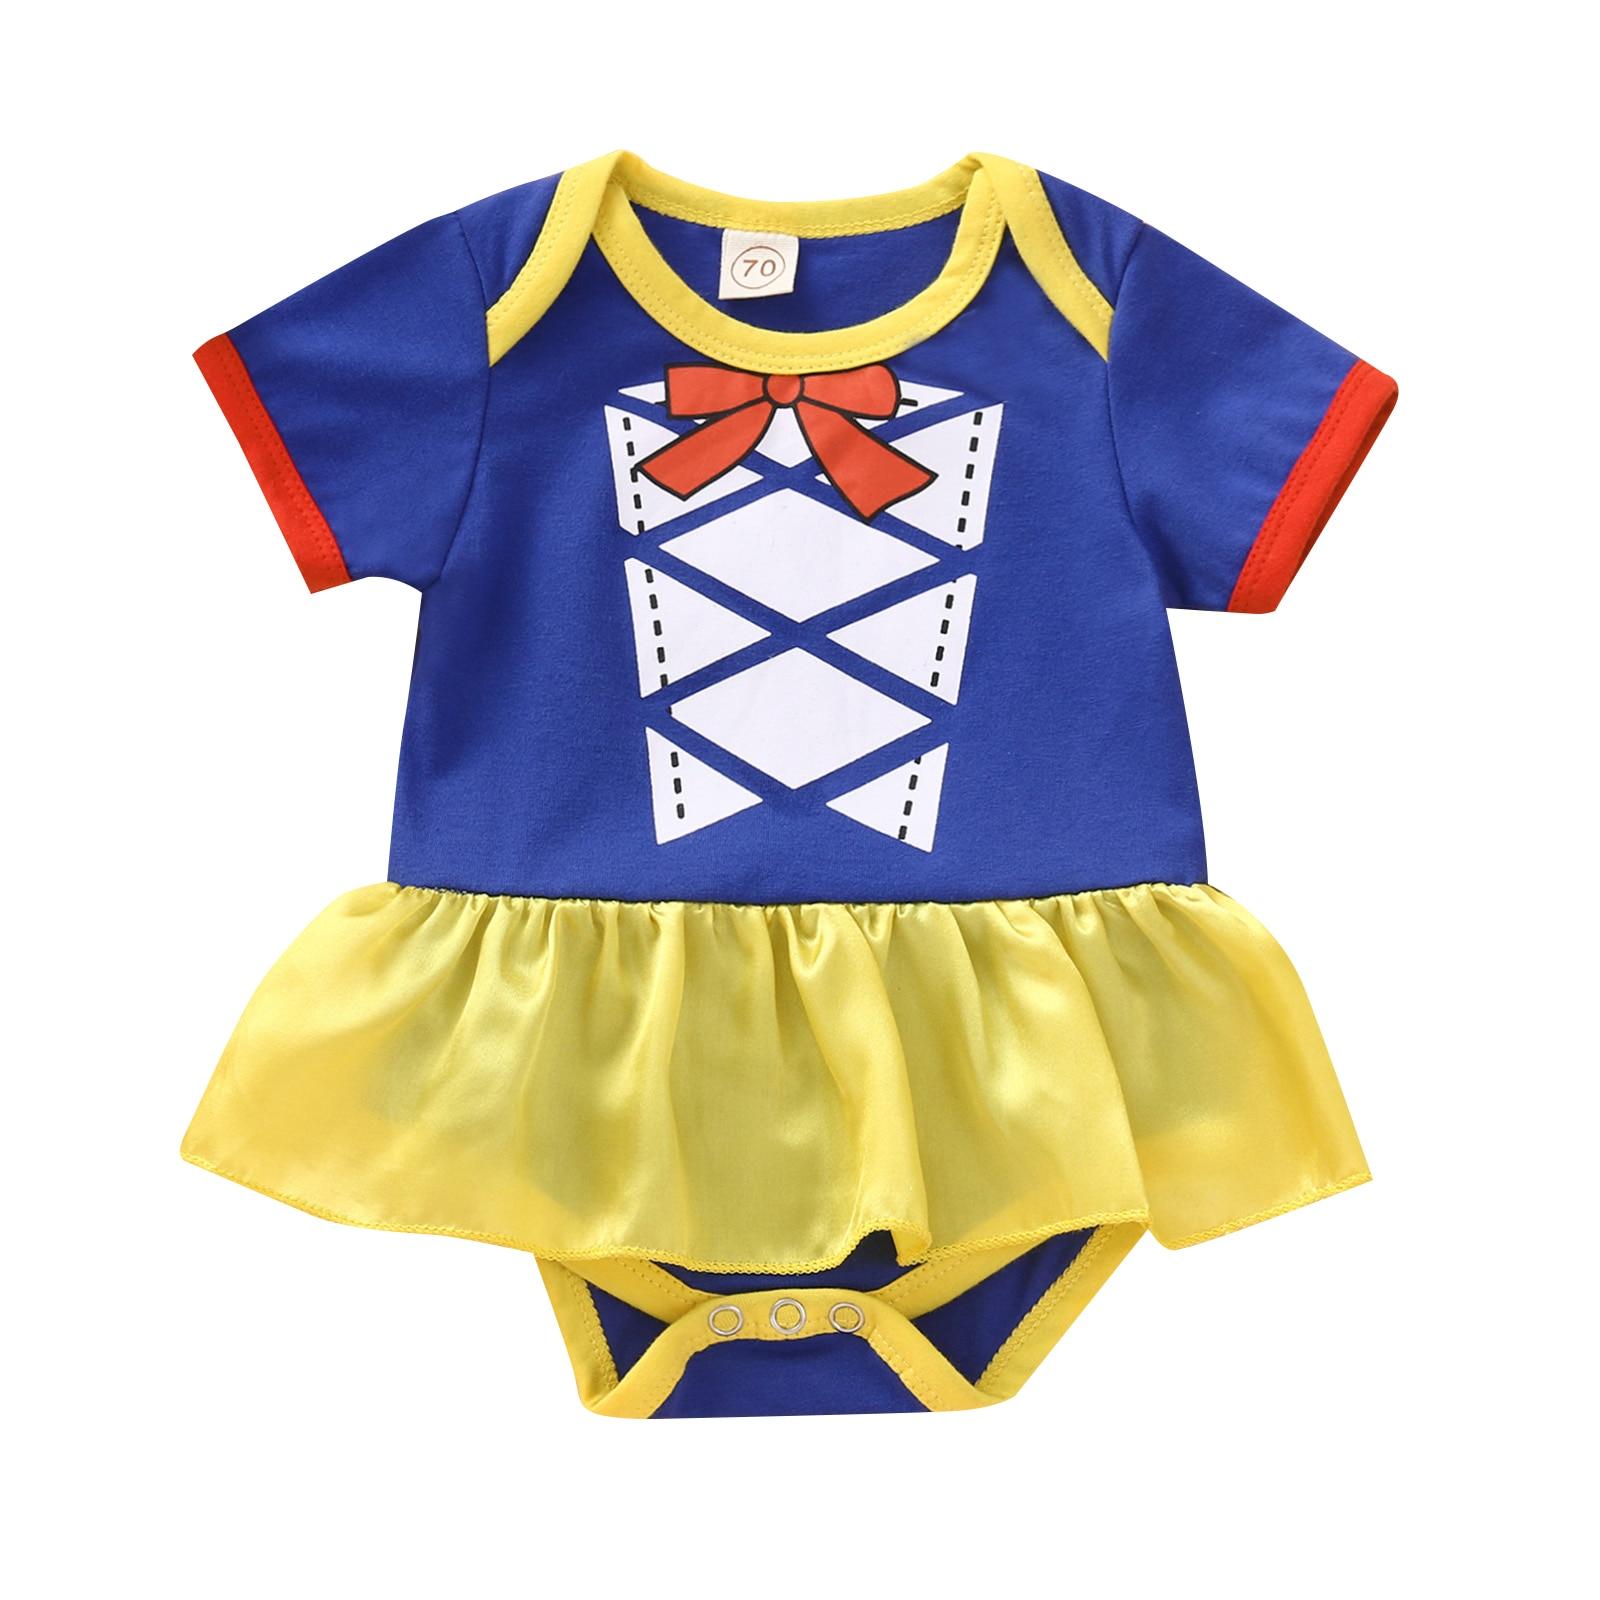 Princess Baby Girls Bodysuits Dress Pattern Patchwork Short Sleeve Lace Tutu Jumpsuits 0-24M